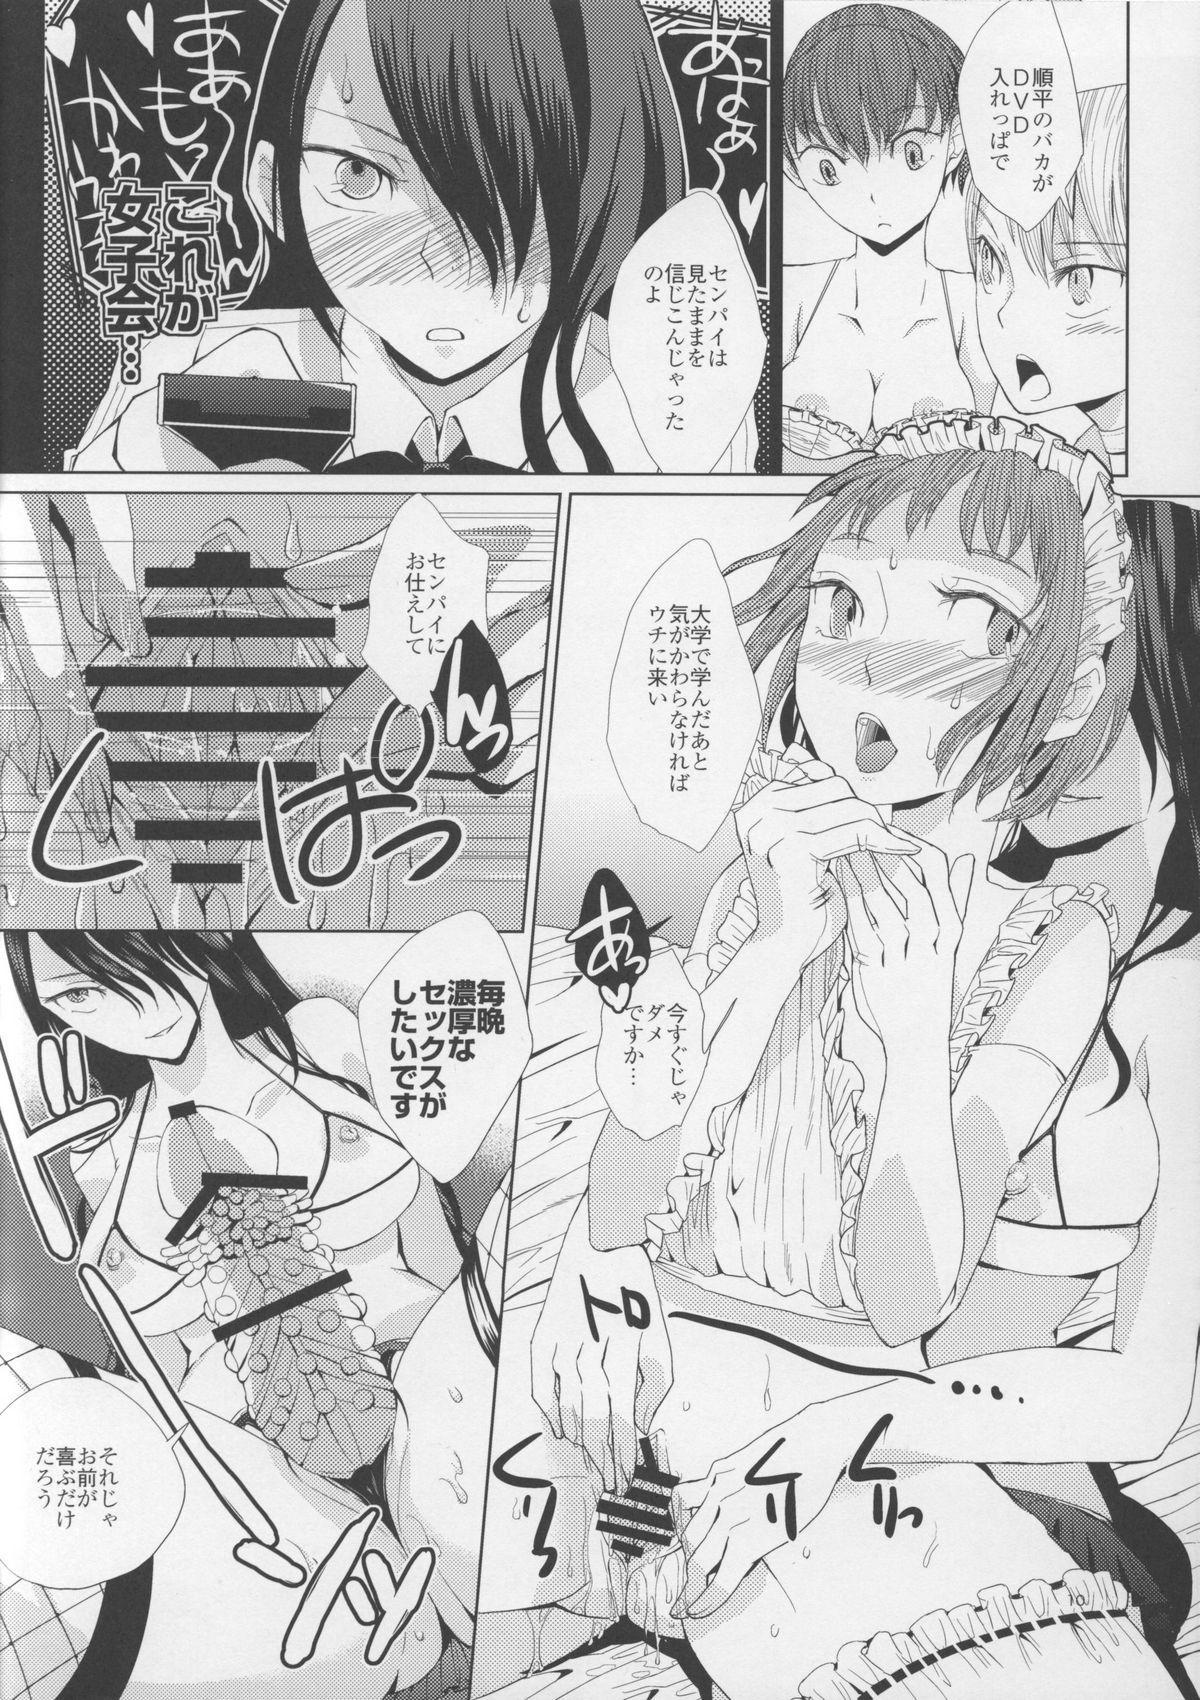 YURI SONA 2 Yoru no Joou - Midnight Queen 8